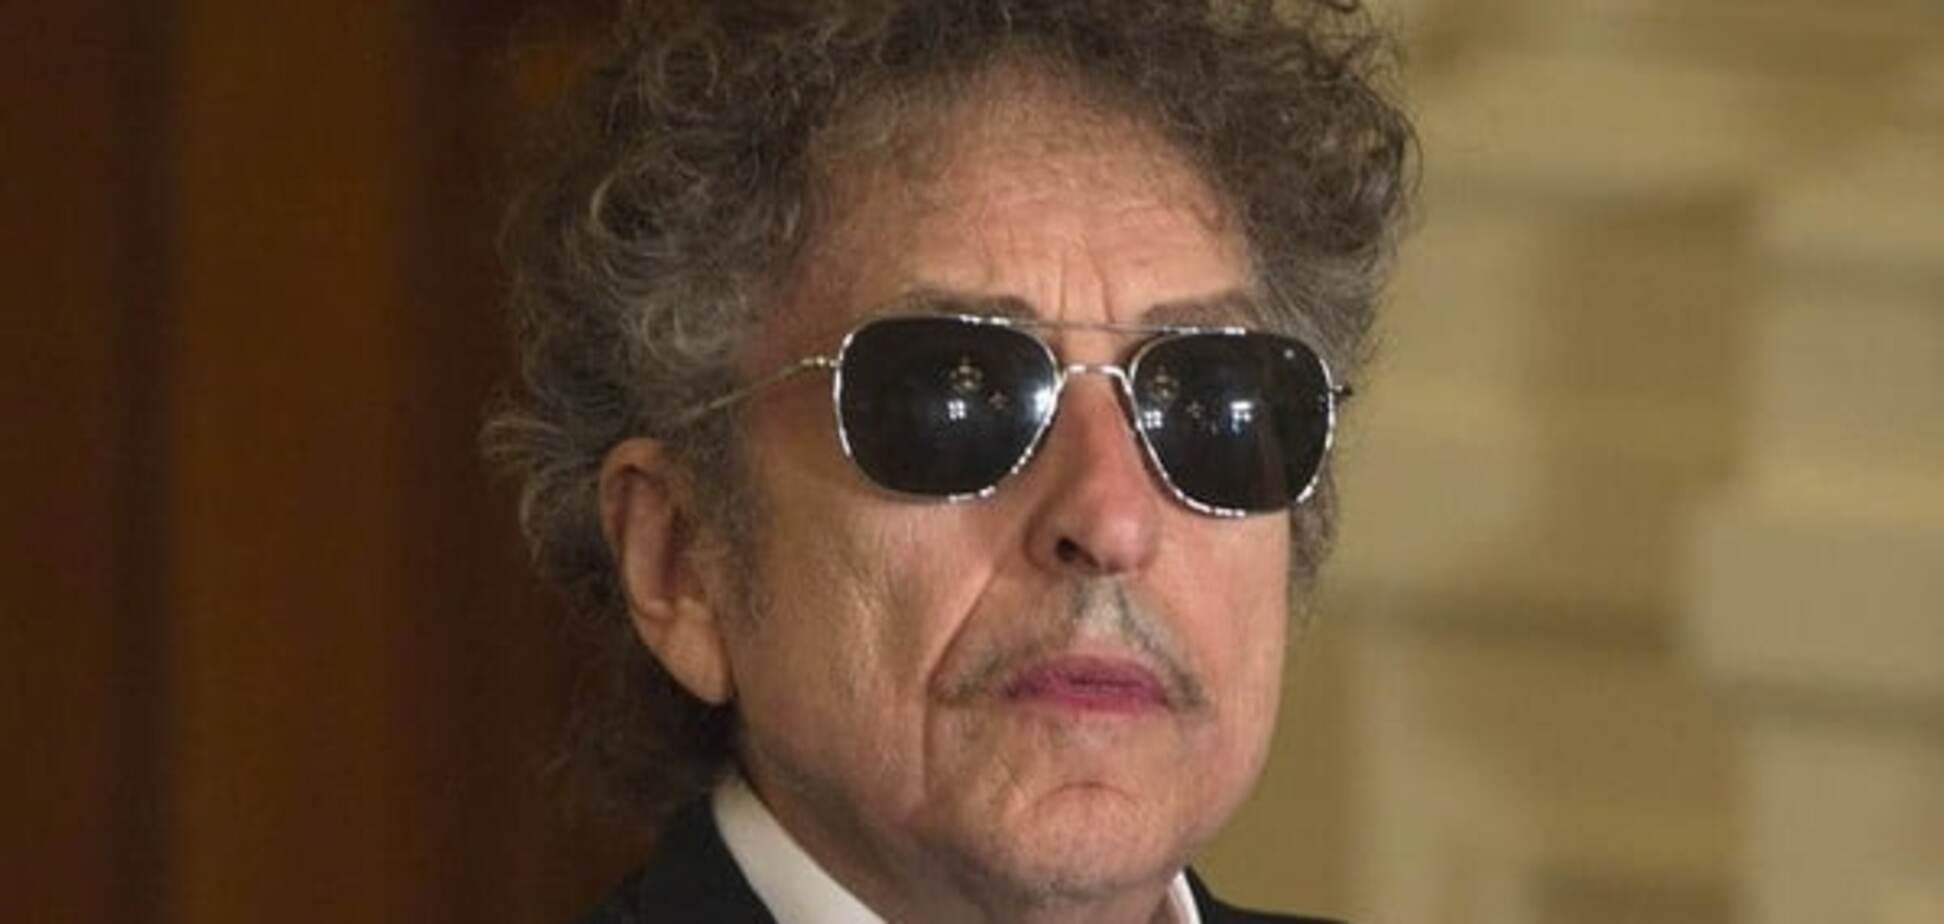 Так кто же он, русский Боб Дилан?! - Бобдилан?